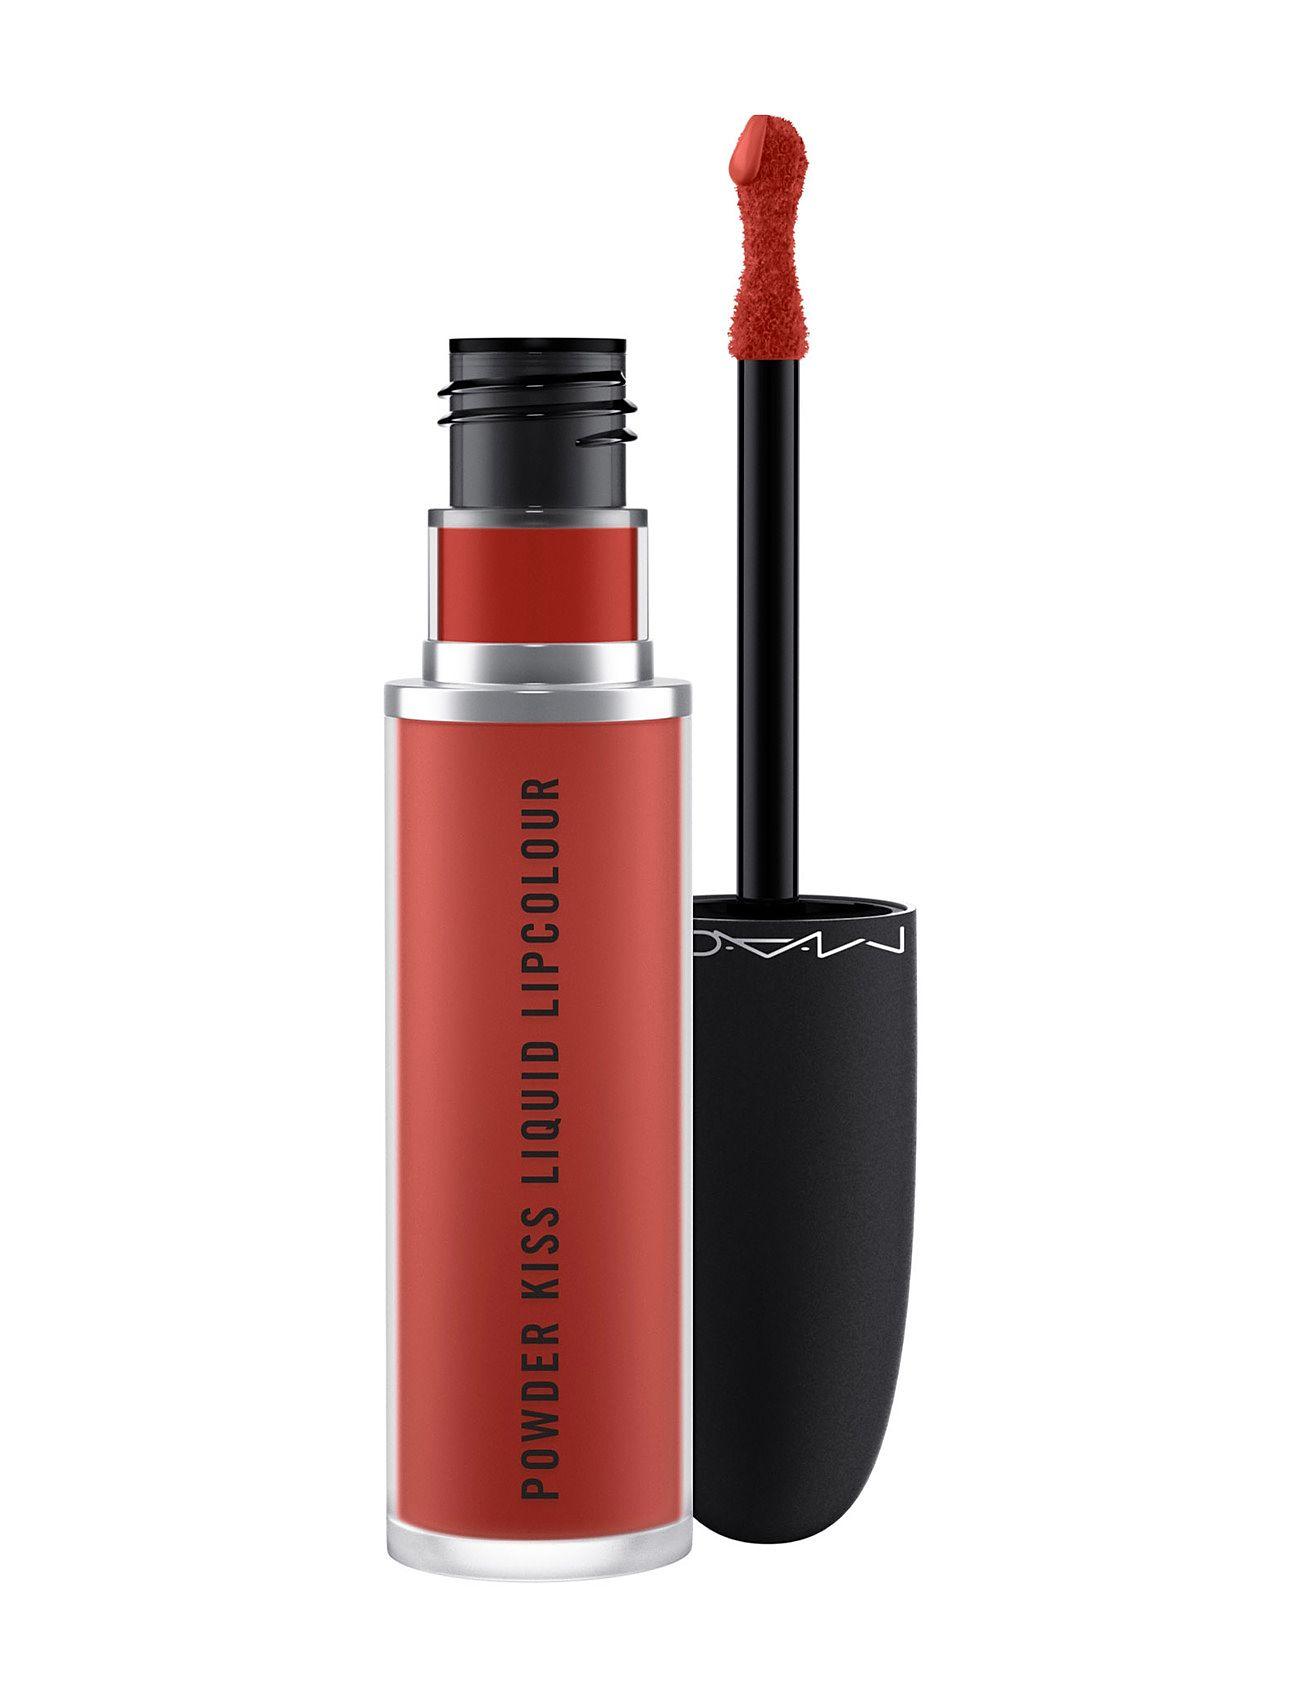 Image of Powder Kiss Liquid Lipcolour Lipgloss Makeup Rød M.A.C. (3406304257)